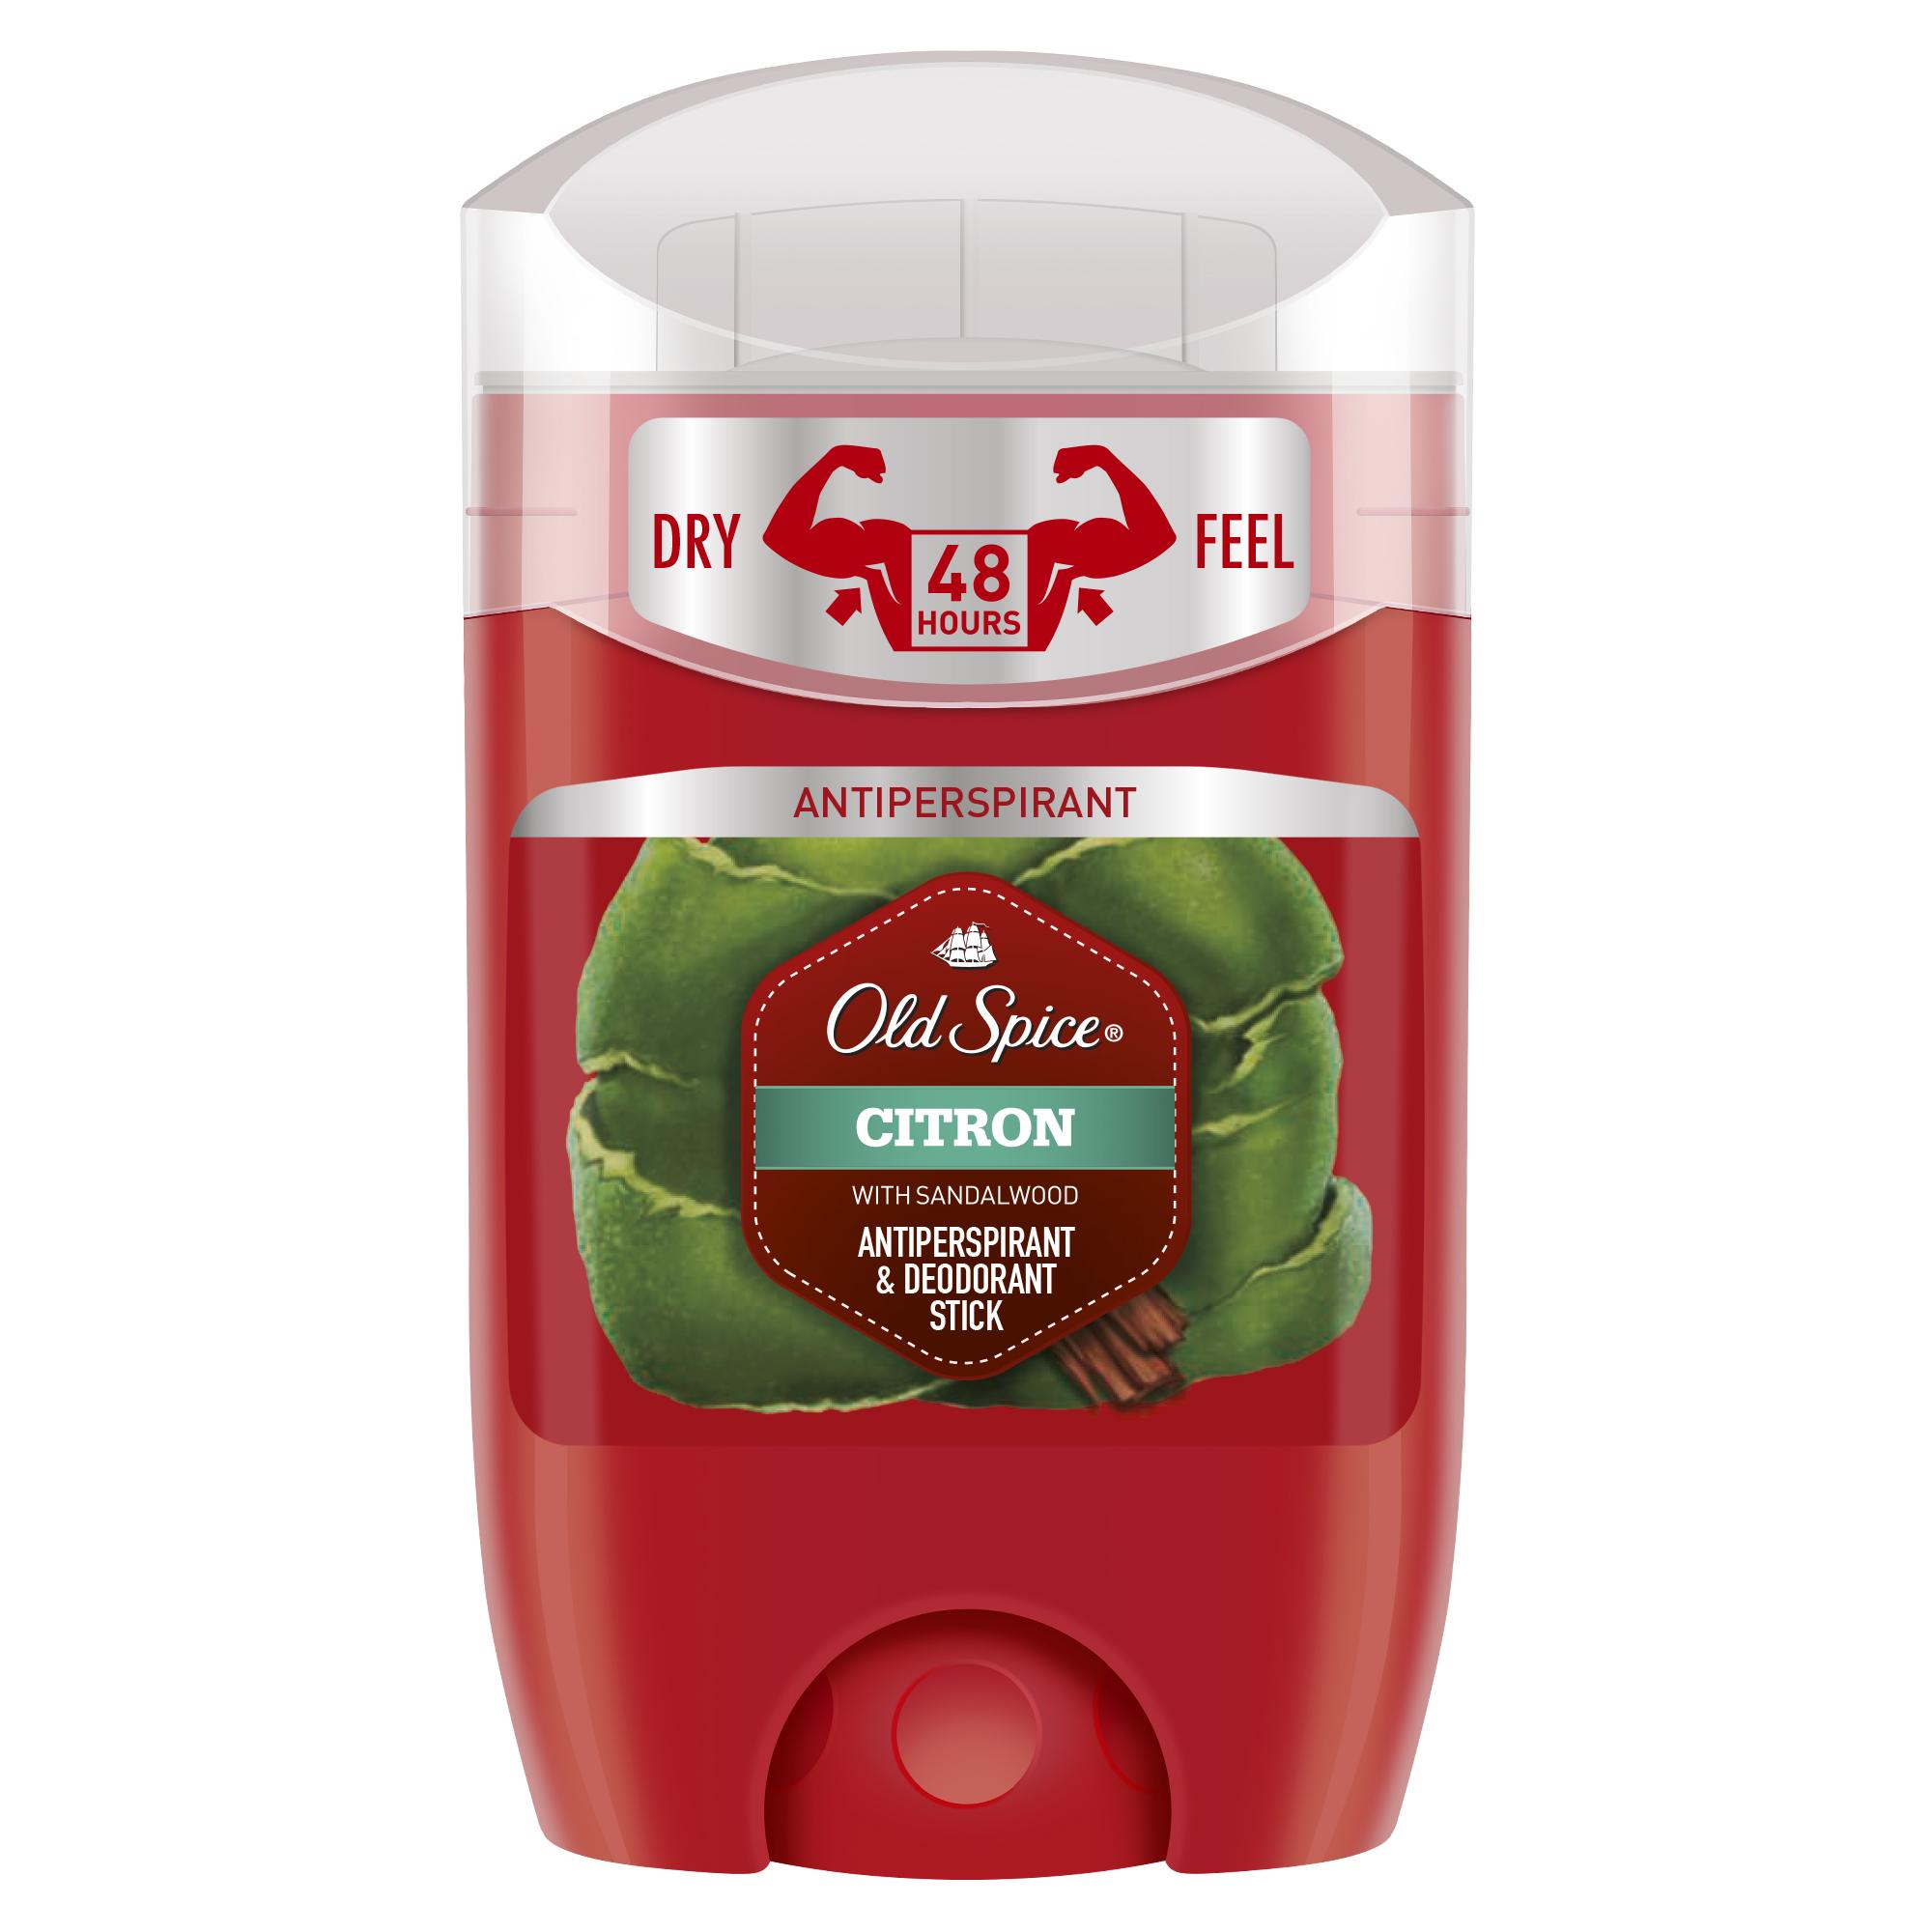 Дезодорант-антиперспирант Old Spice Citron 50 мл